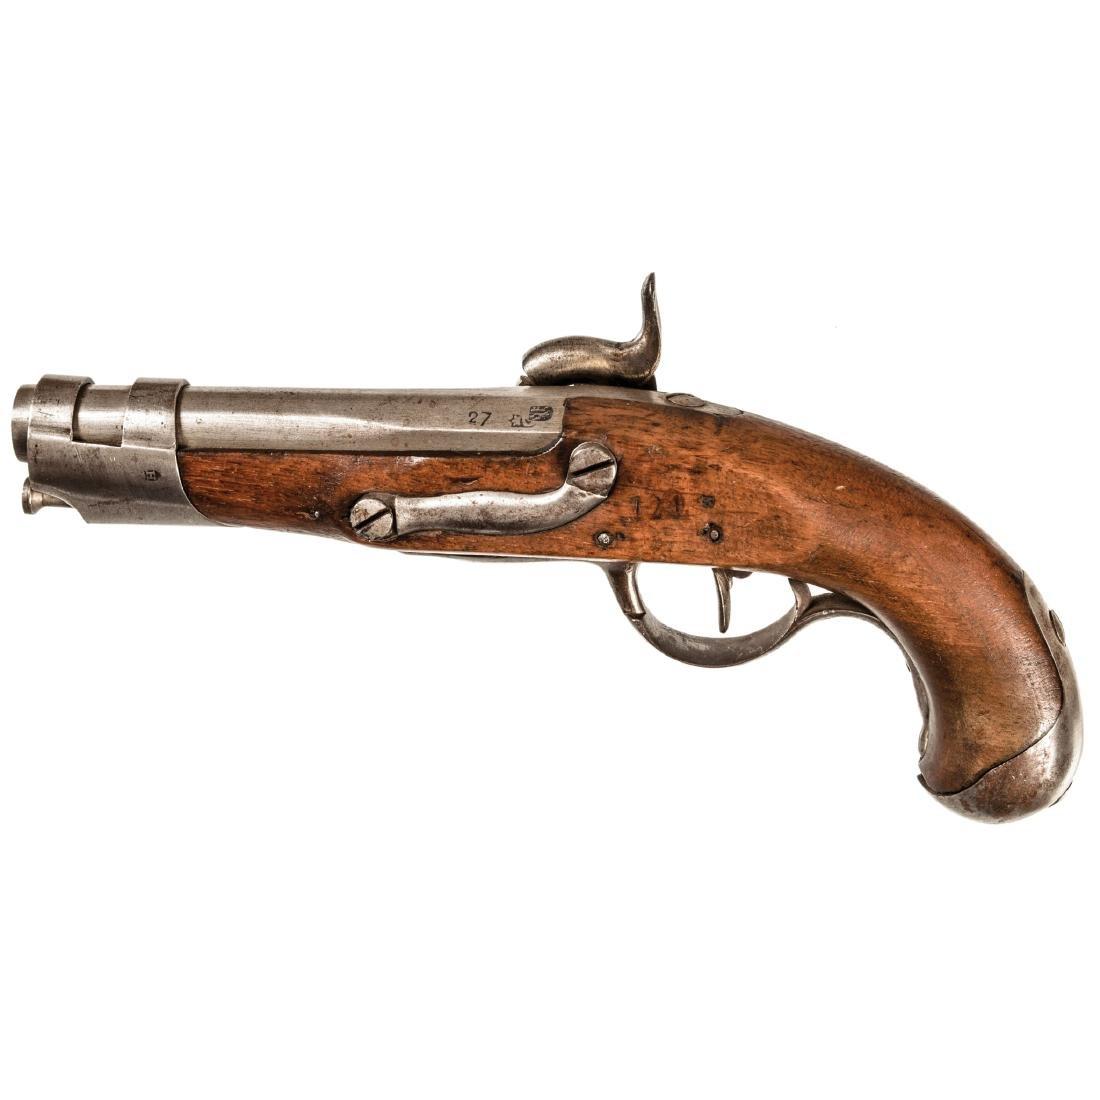 c 1802 French Military Flintlock Pistol Model AN9 - 2